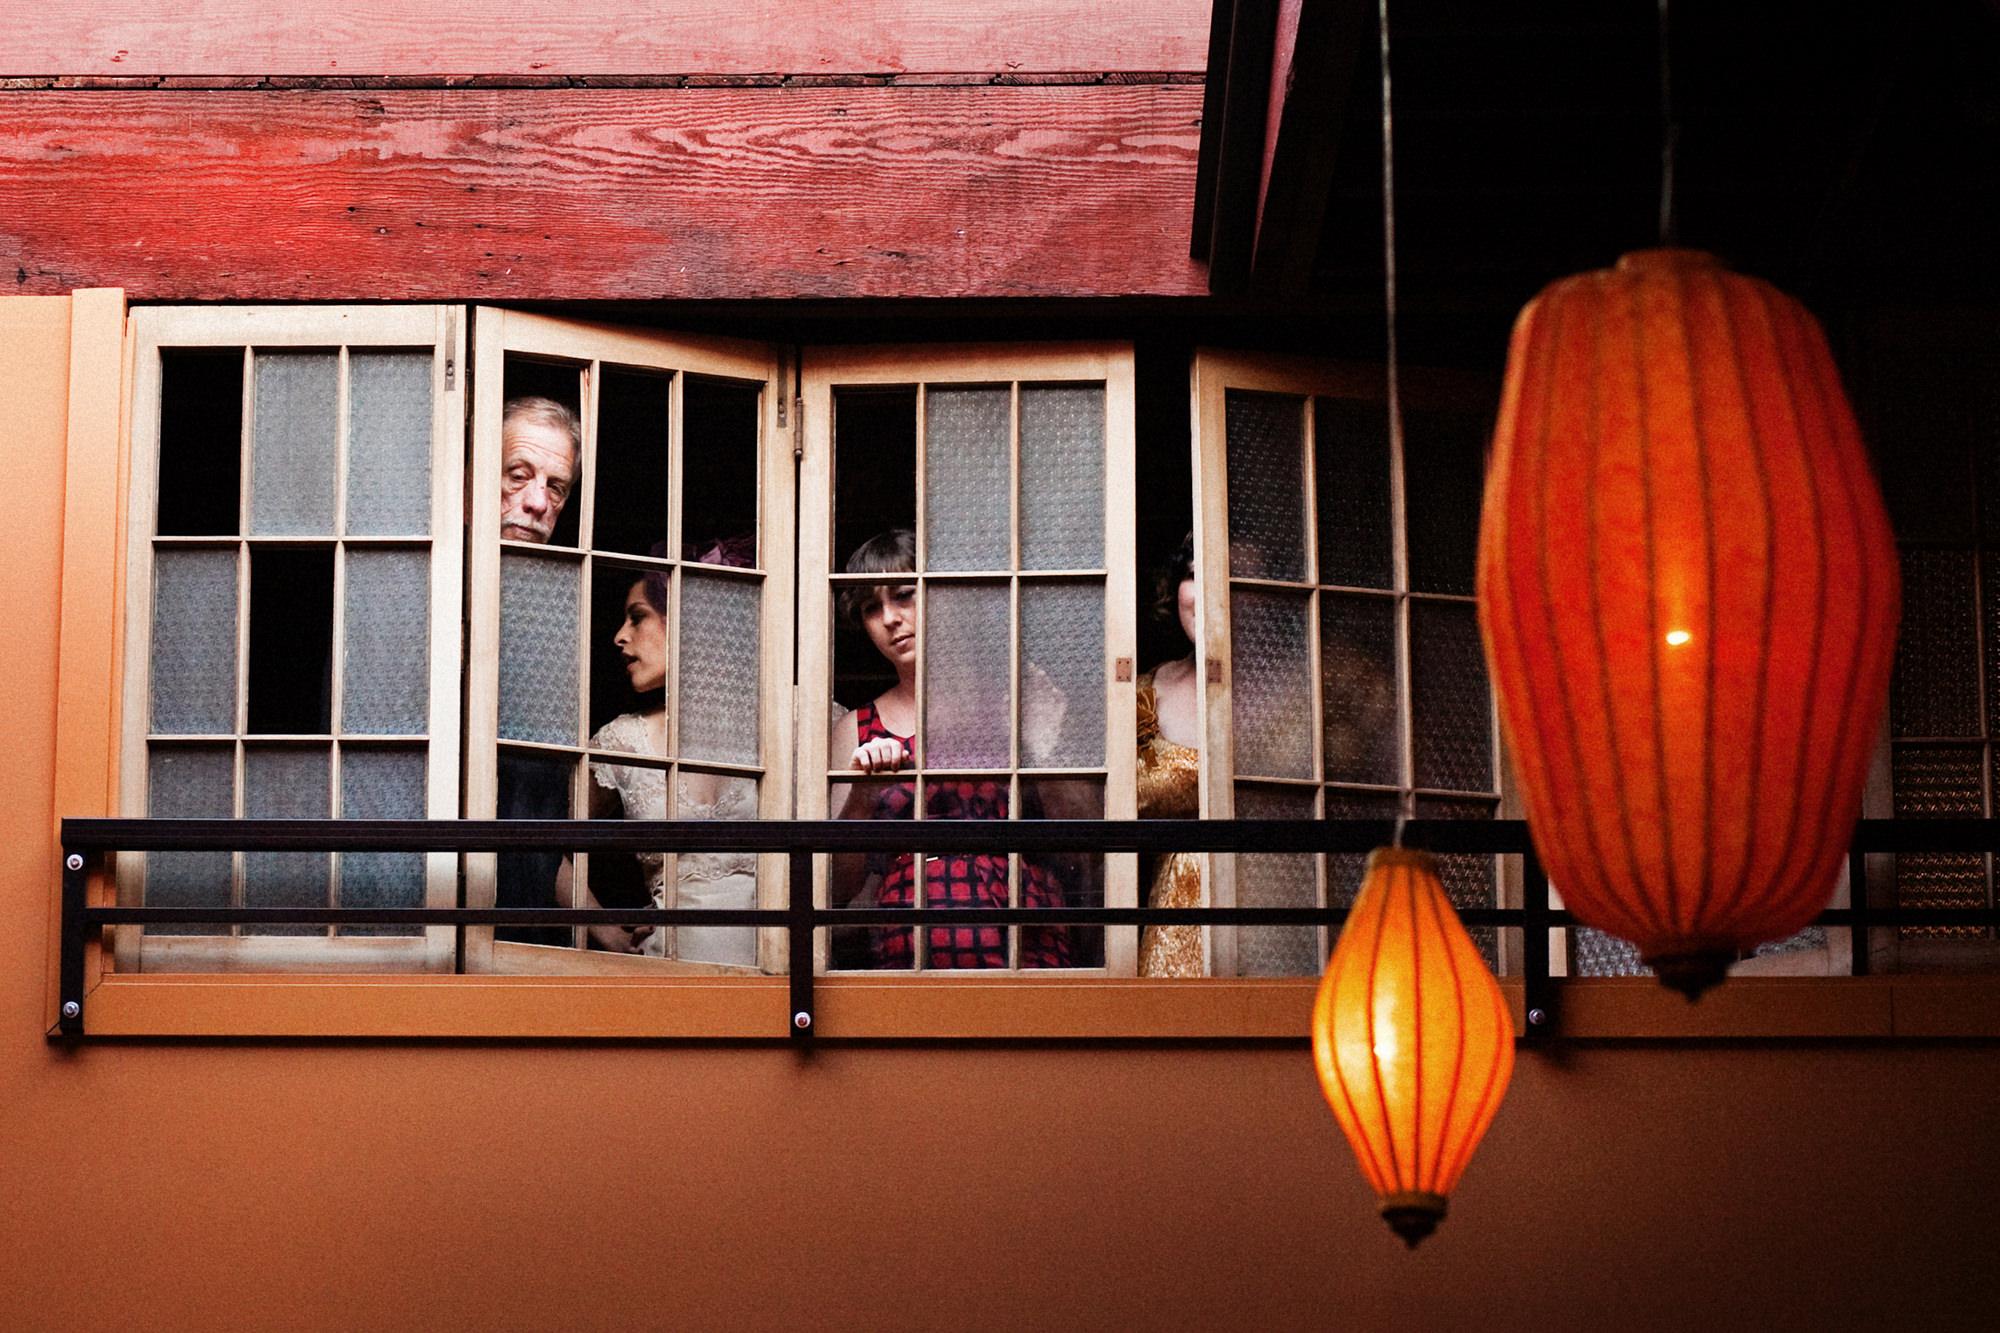 guests-await-the-wedding-through-window-worlds-best-wedding-photos-jenny-jimenez-seattle-wedding-photographers